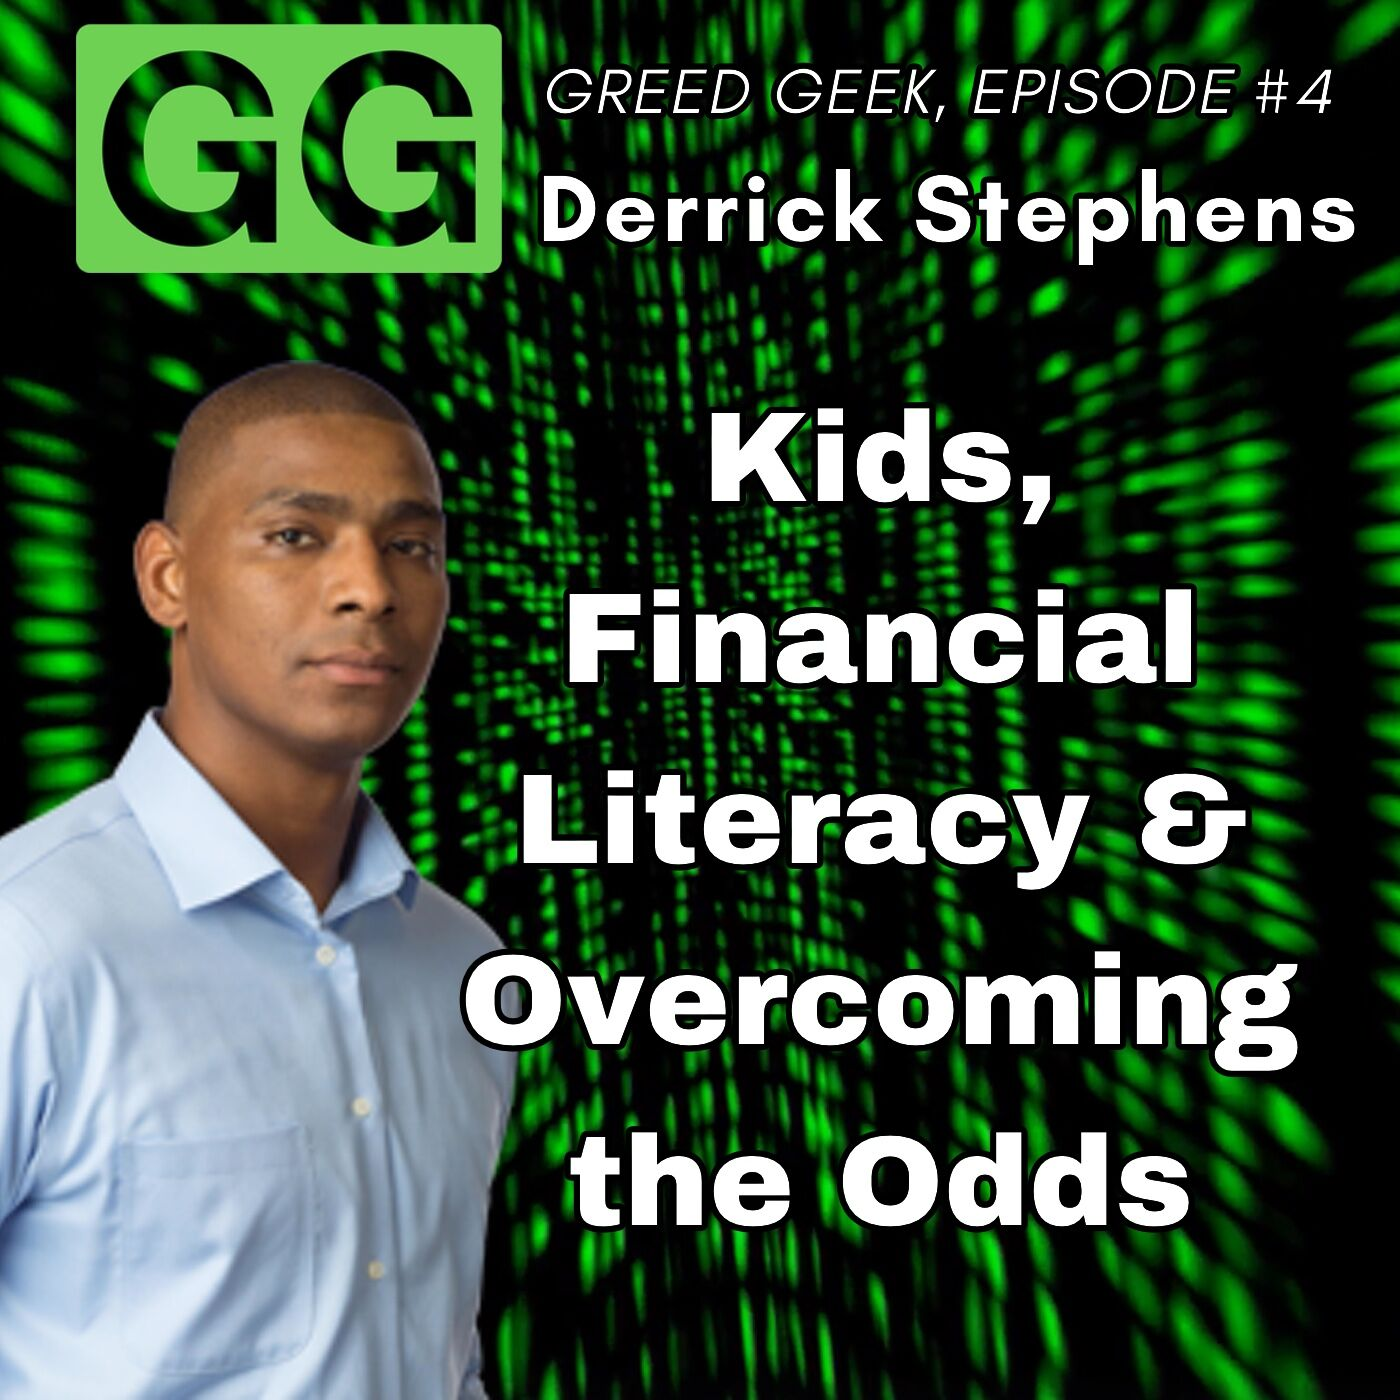 #4 - Derrick Stephens: Kids, Financial Literacy & Overcoming the Odds